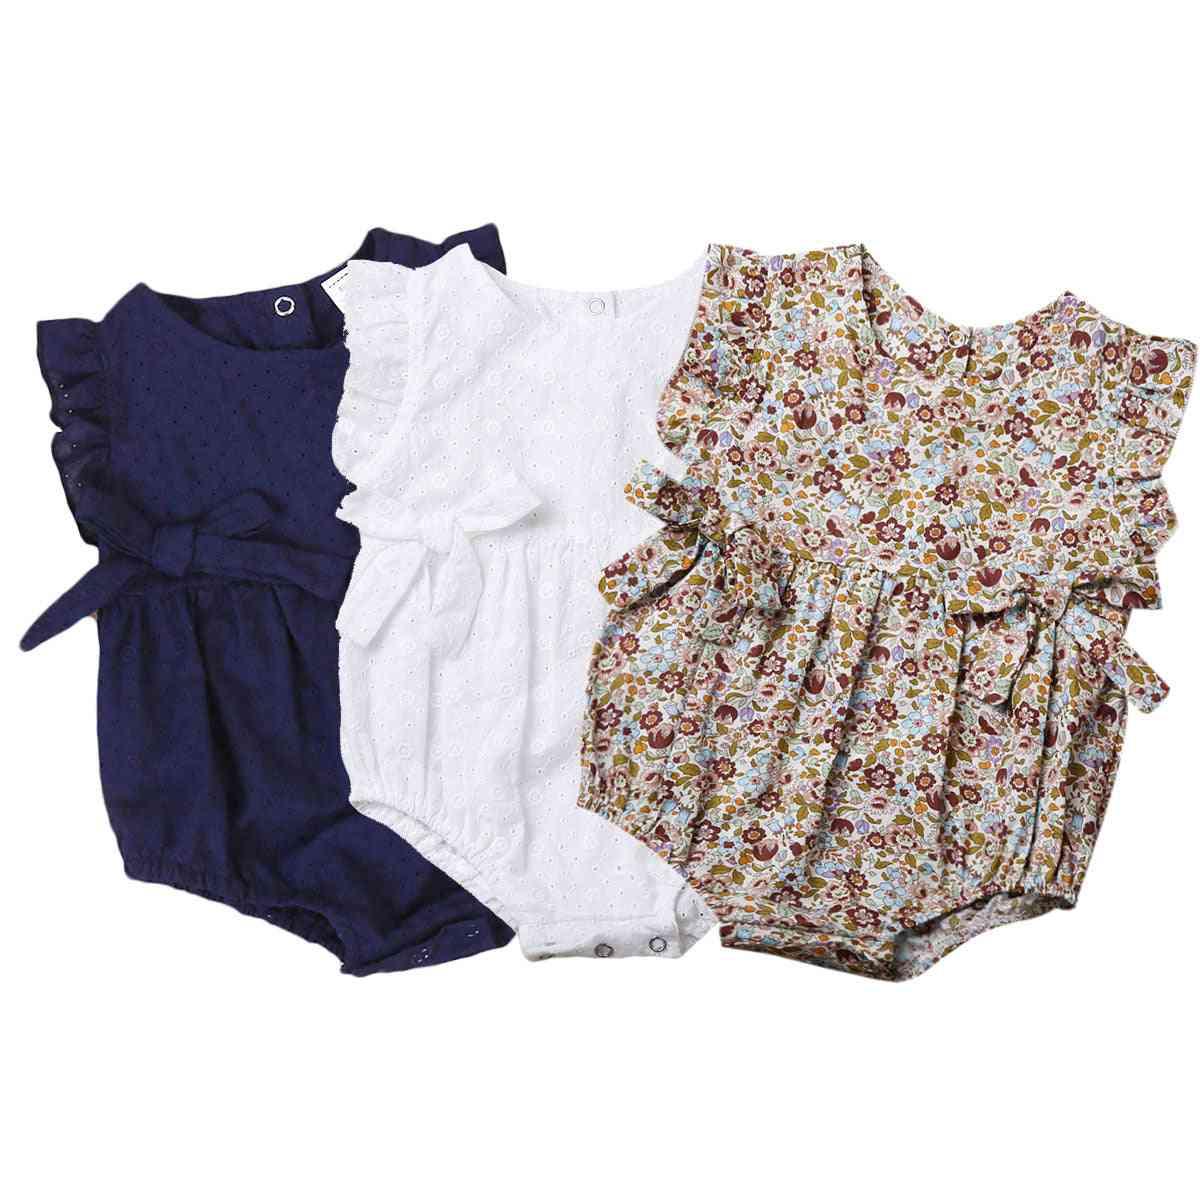 Summer Flower Printed, Ruffles Pattern- Romper For Newborn